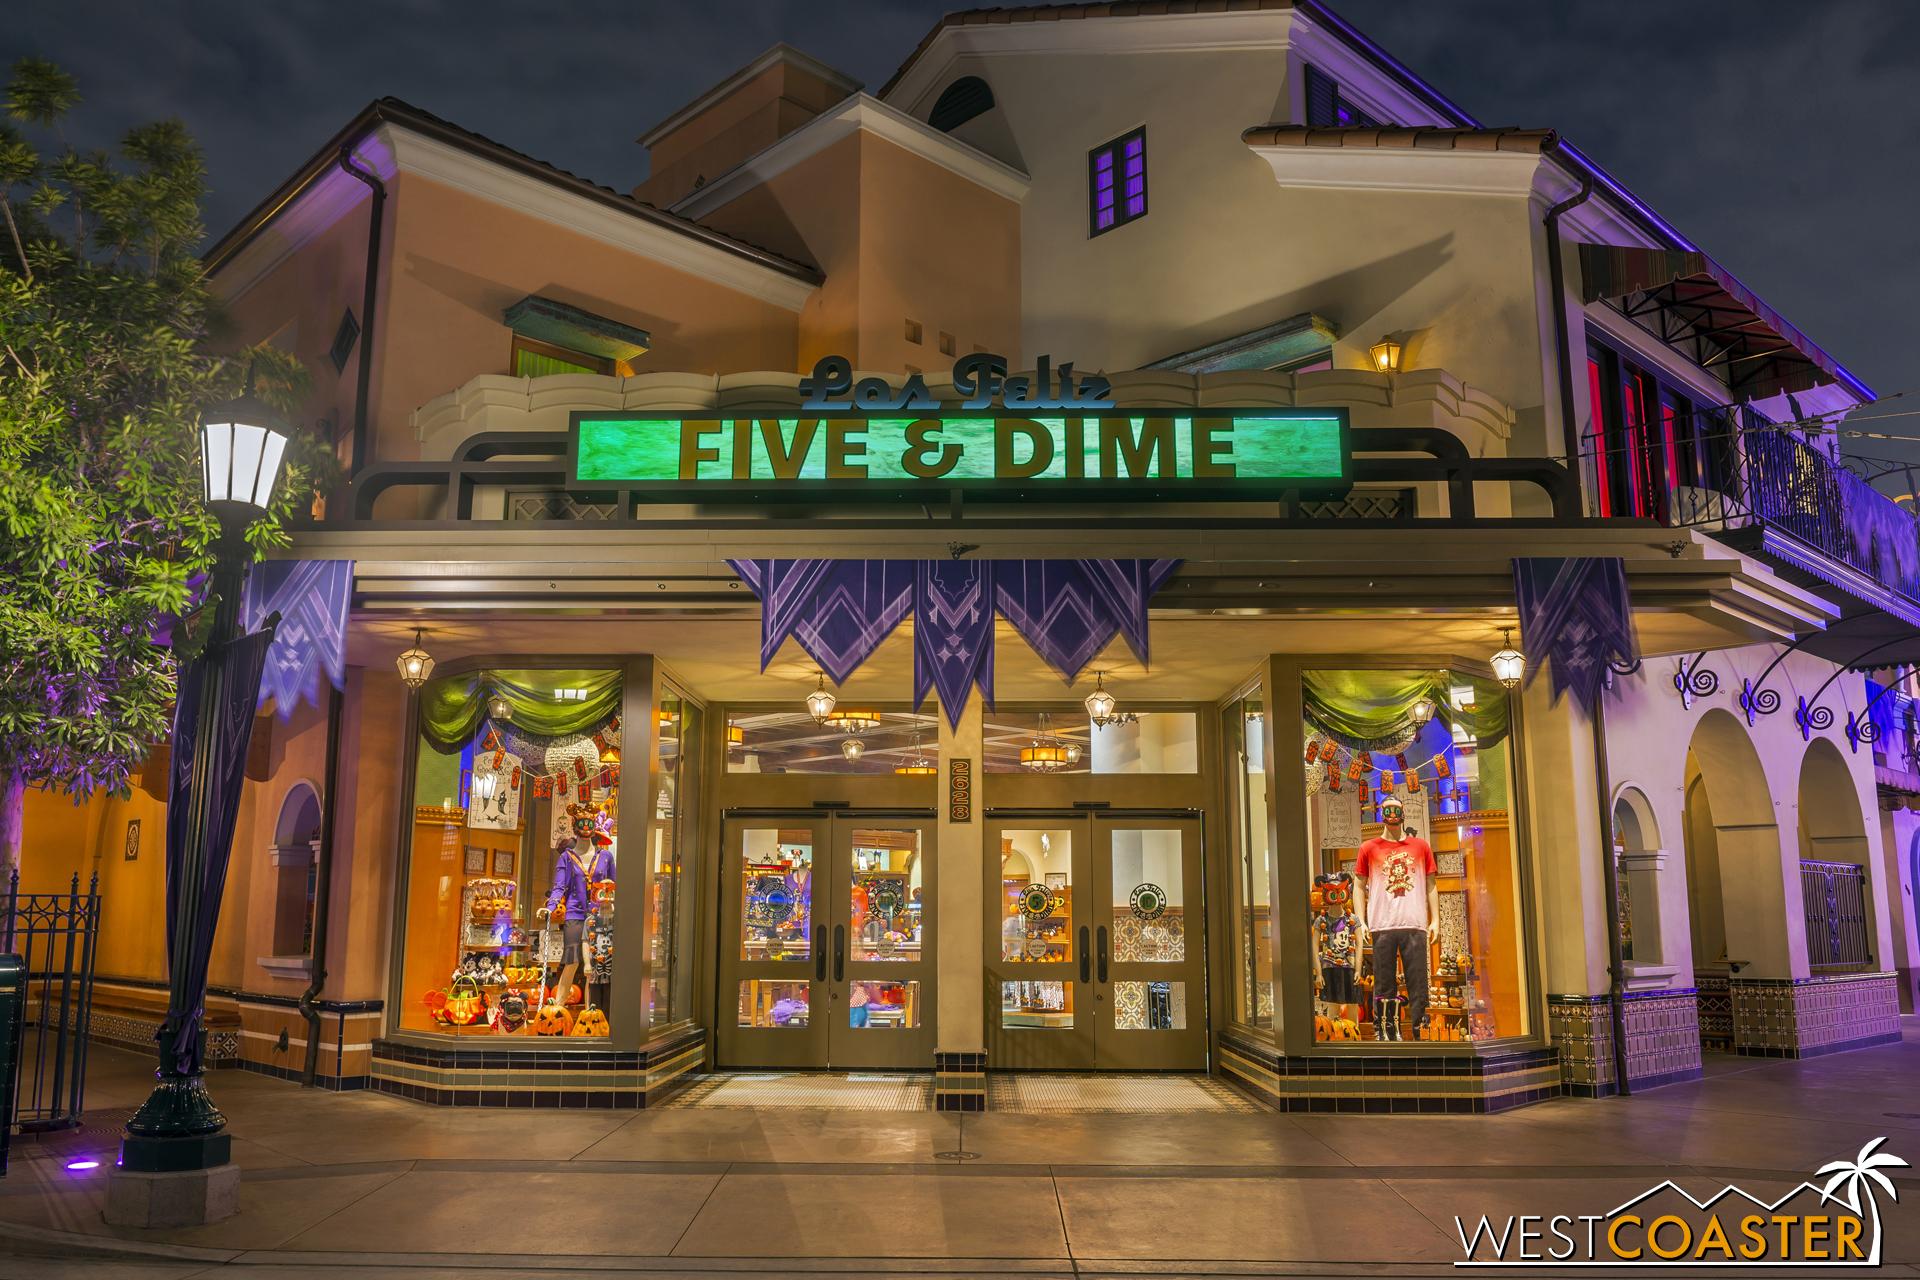 By night, Buena Vista Street was transformed.